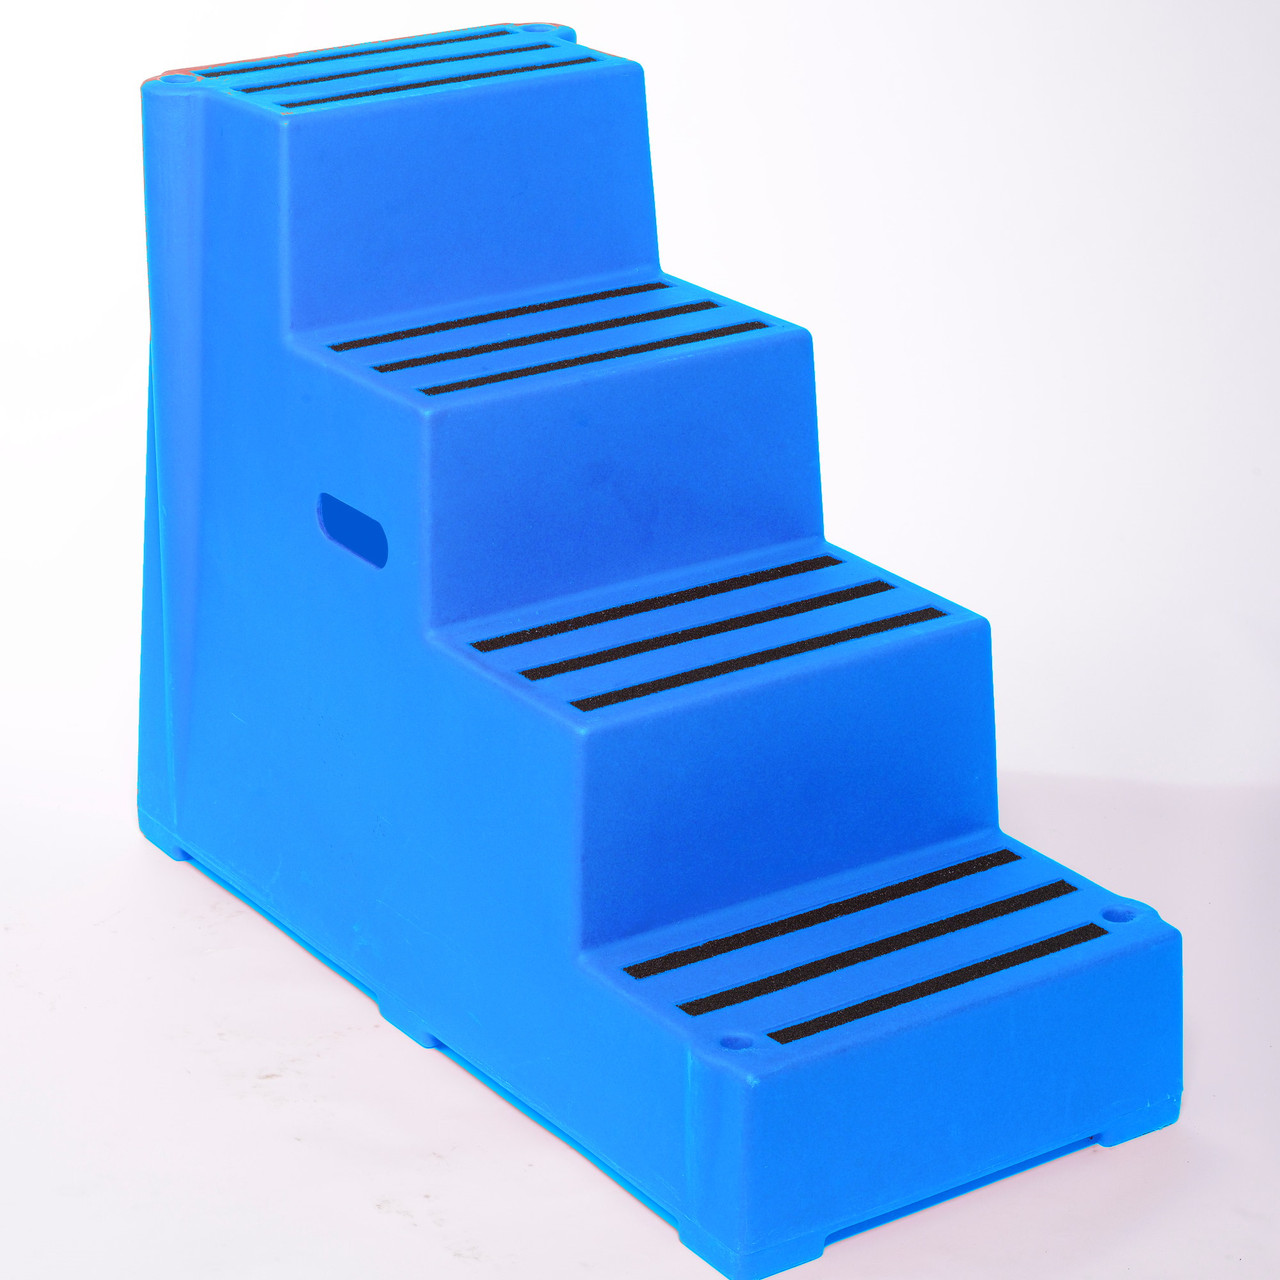 Blue 4 tread plastic safety step